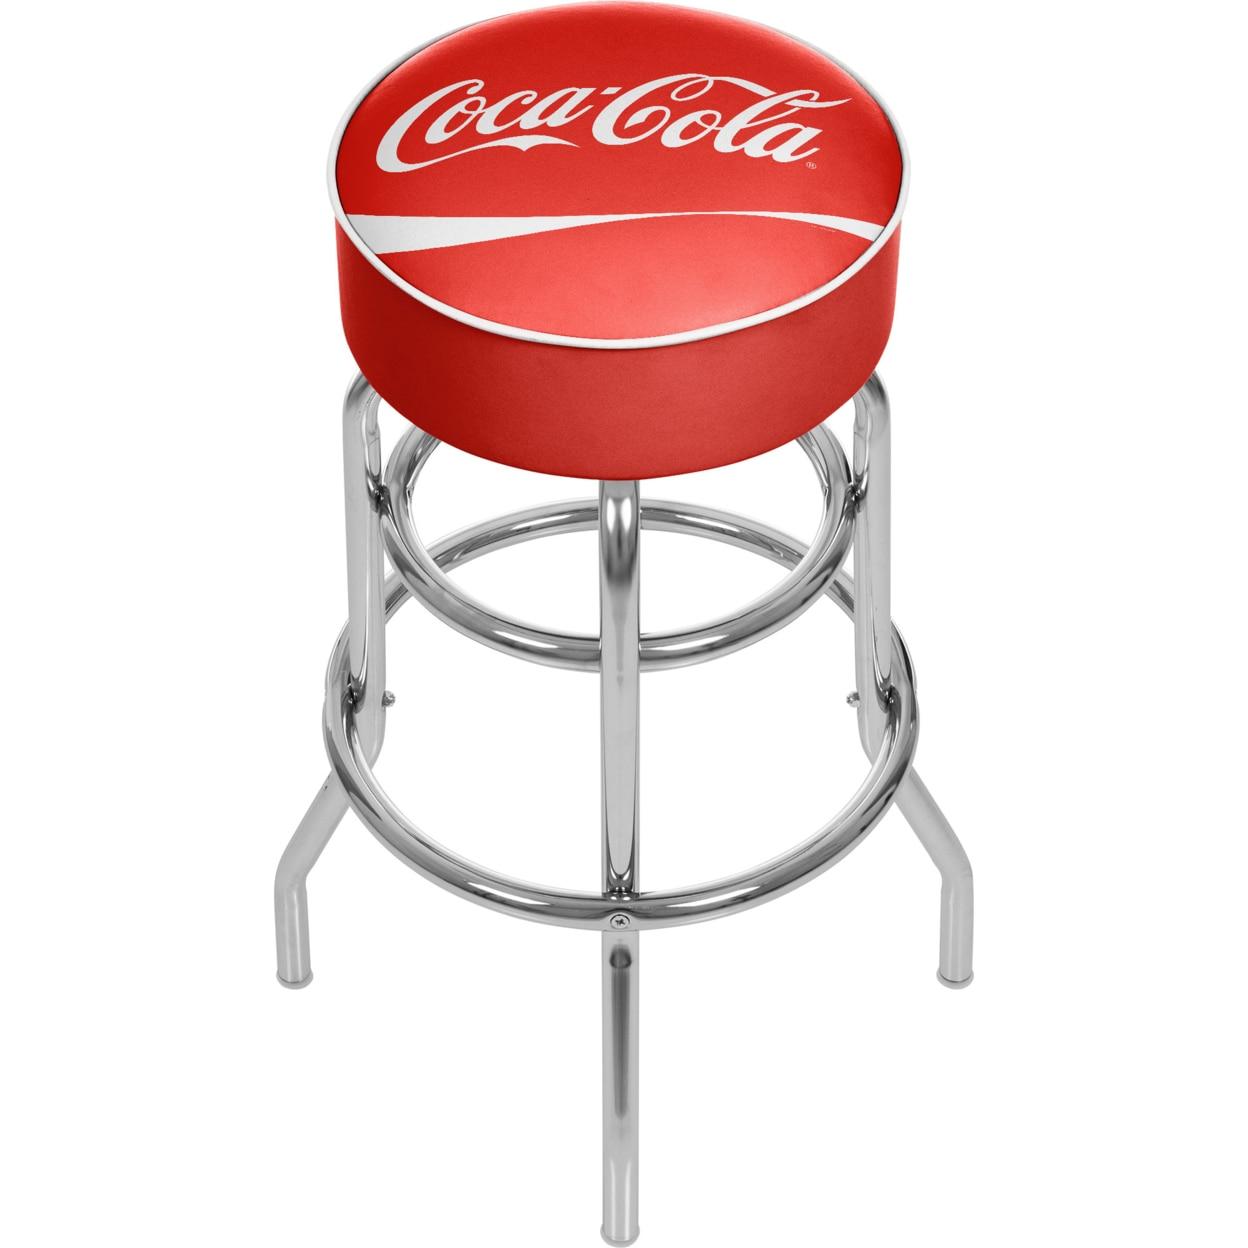 Coca Cola Padded Swivel Bar Stool 30 Inches High coca cola vanilla нижний новгород